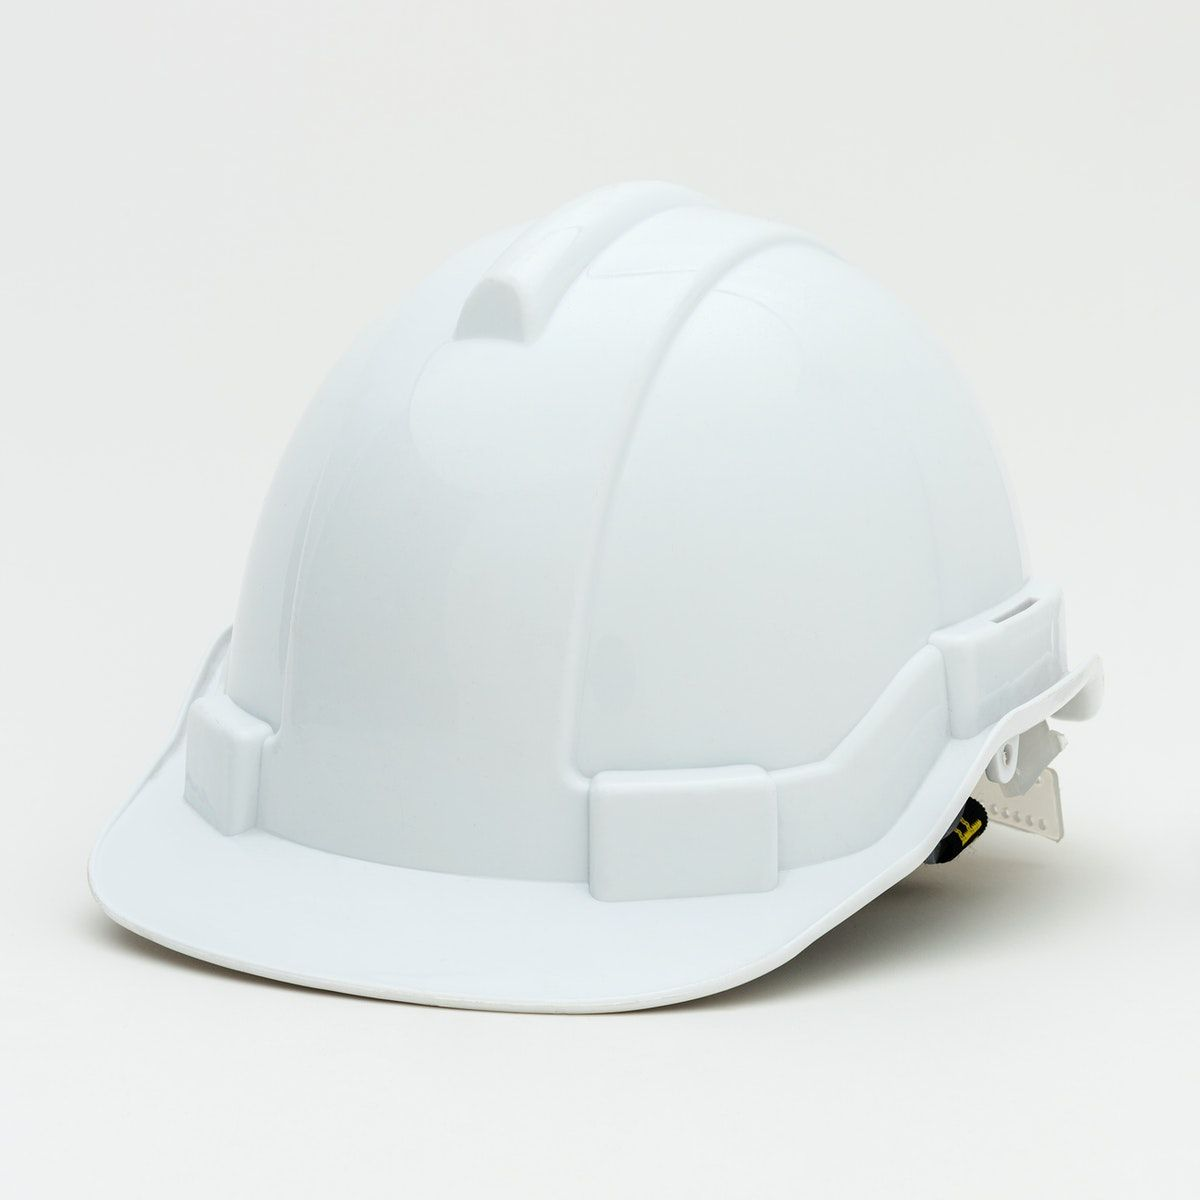 Download Premium Image Of White Hard Hat Design Resource 2366371 Hat Designs Design Resources Hard Hat